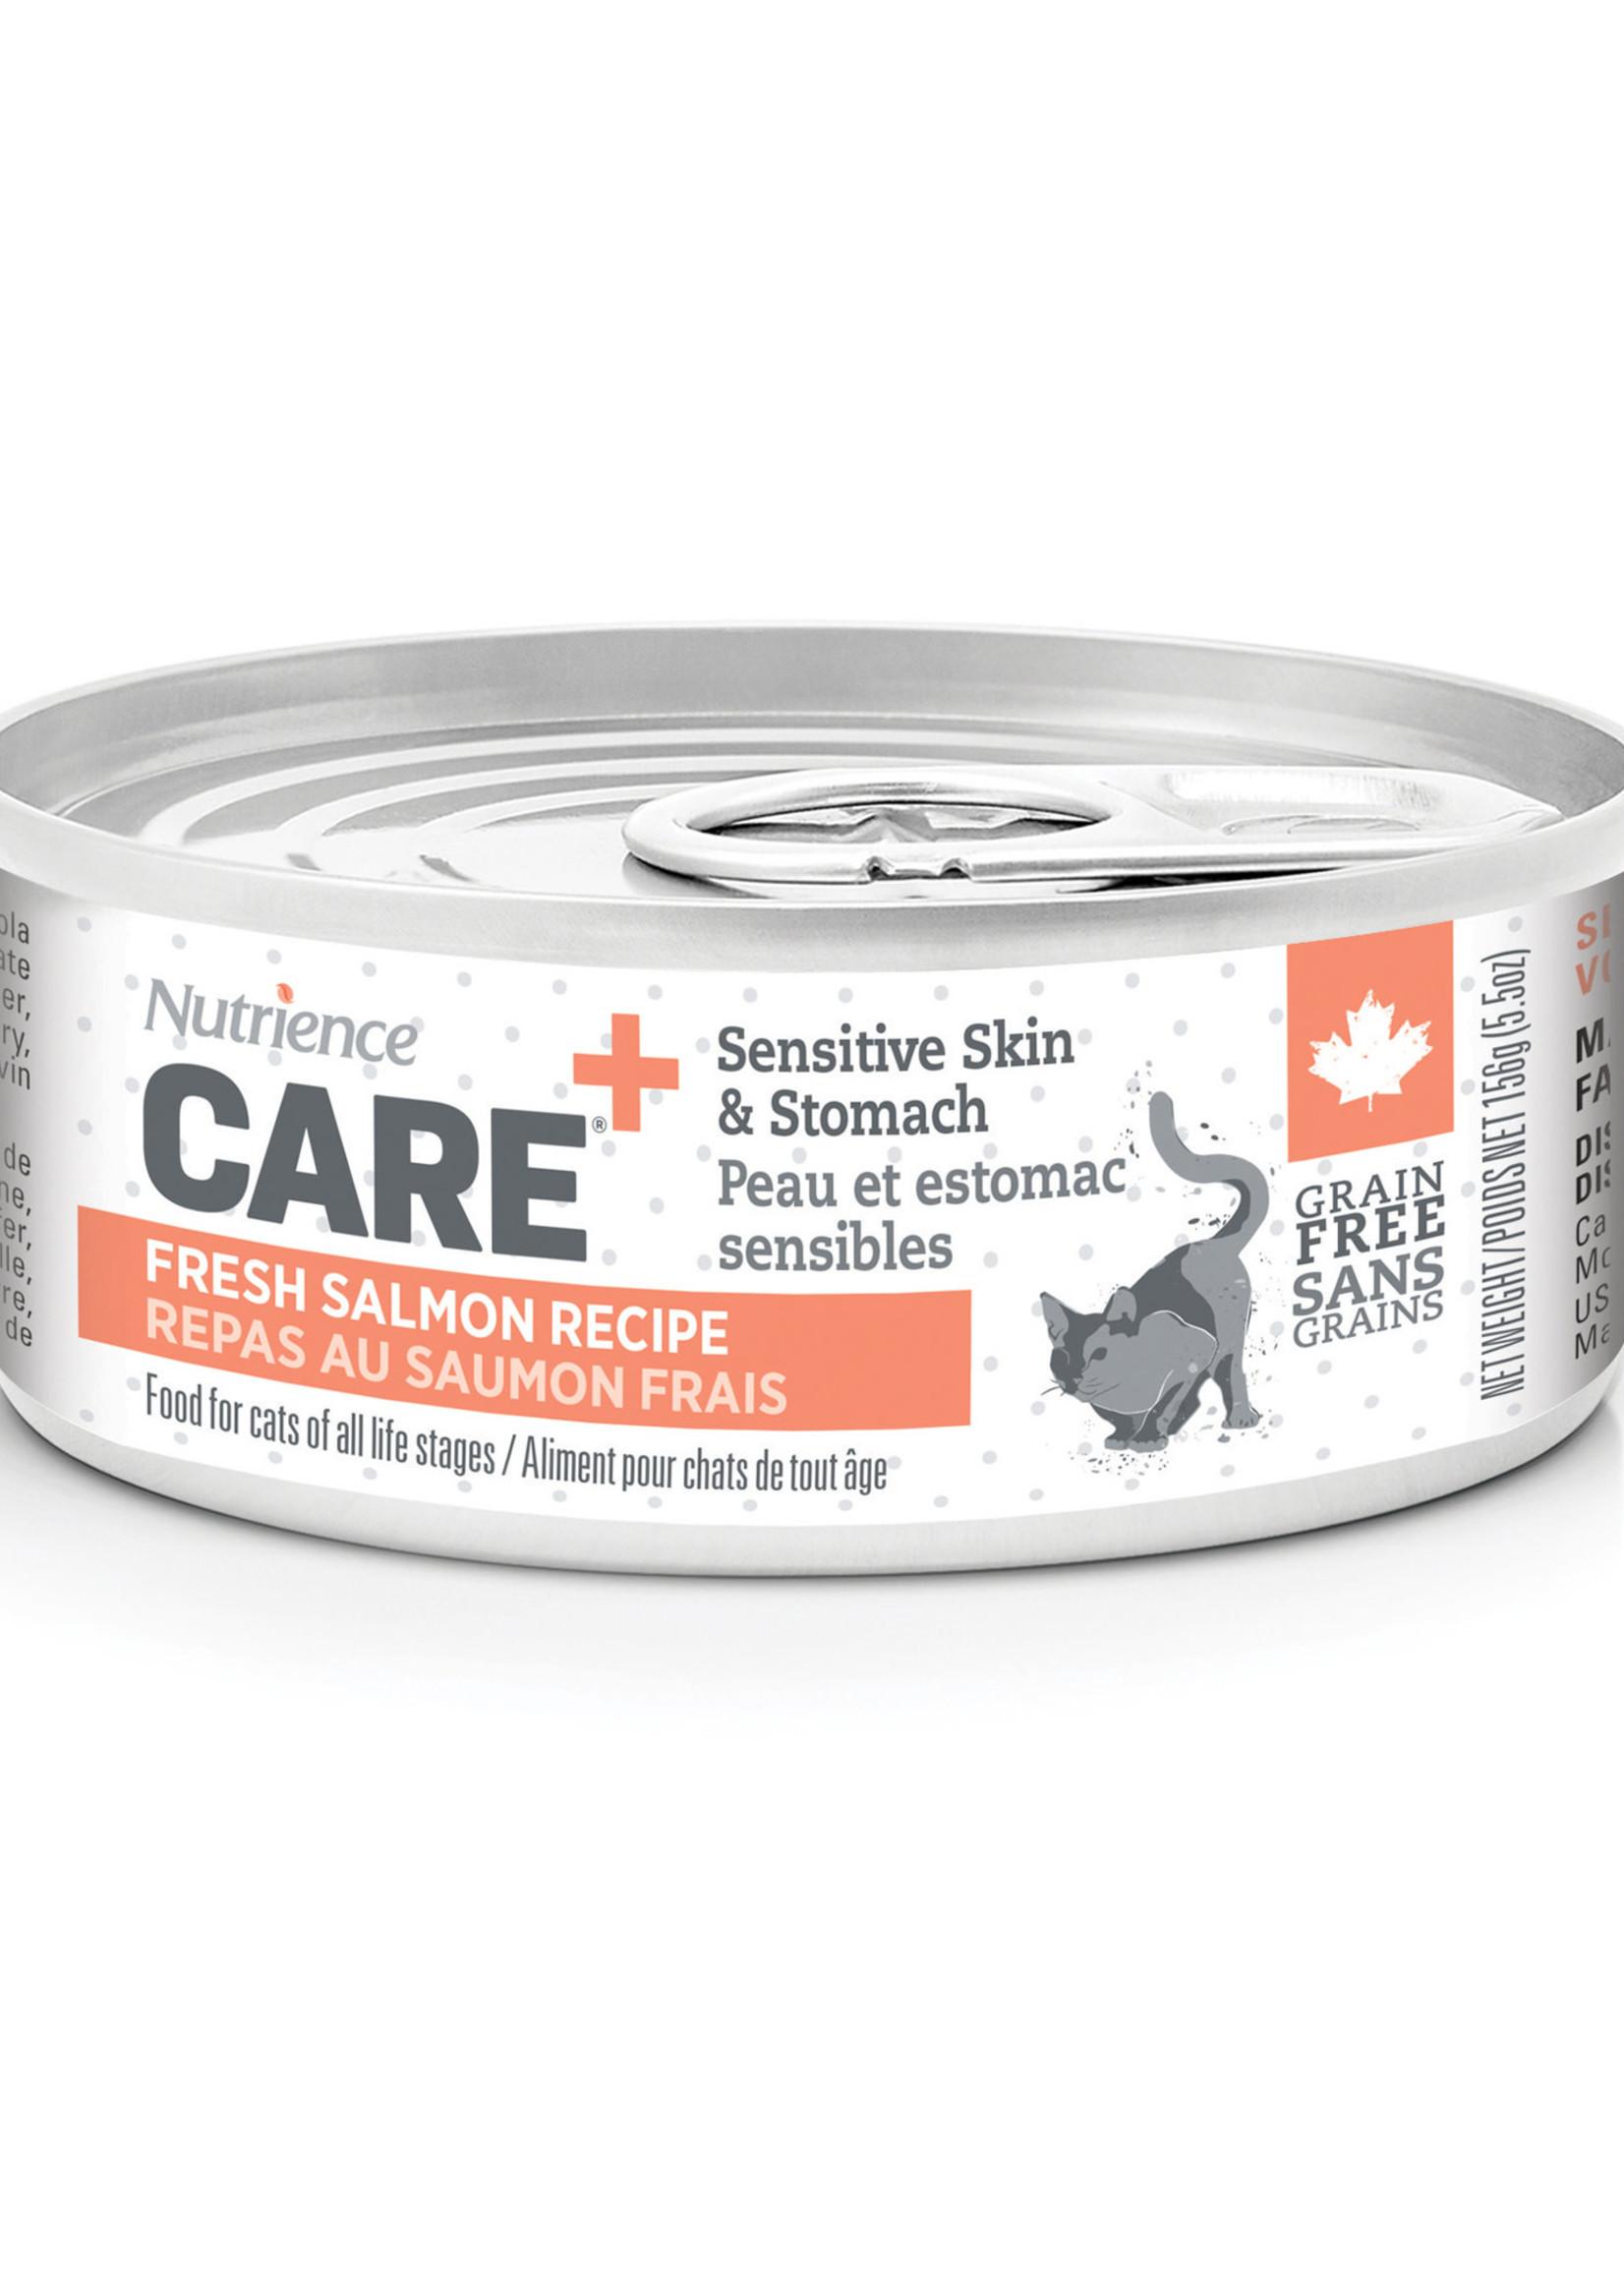 Nutrience Care - Sensitive Skin- Cat Food 156g